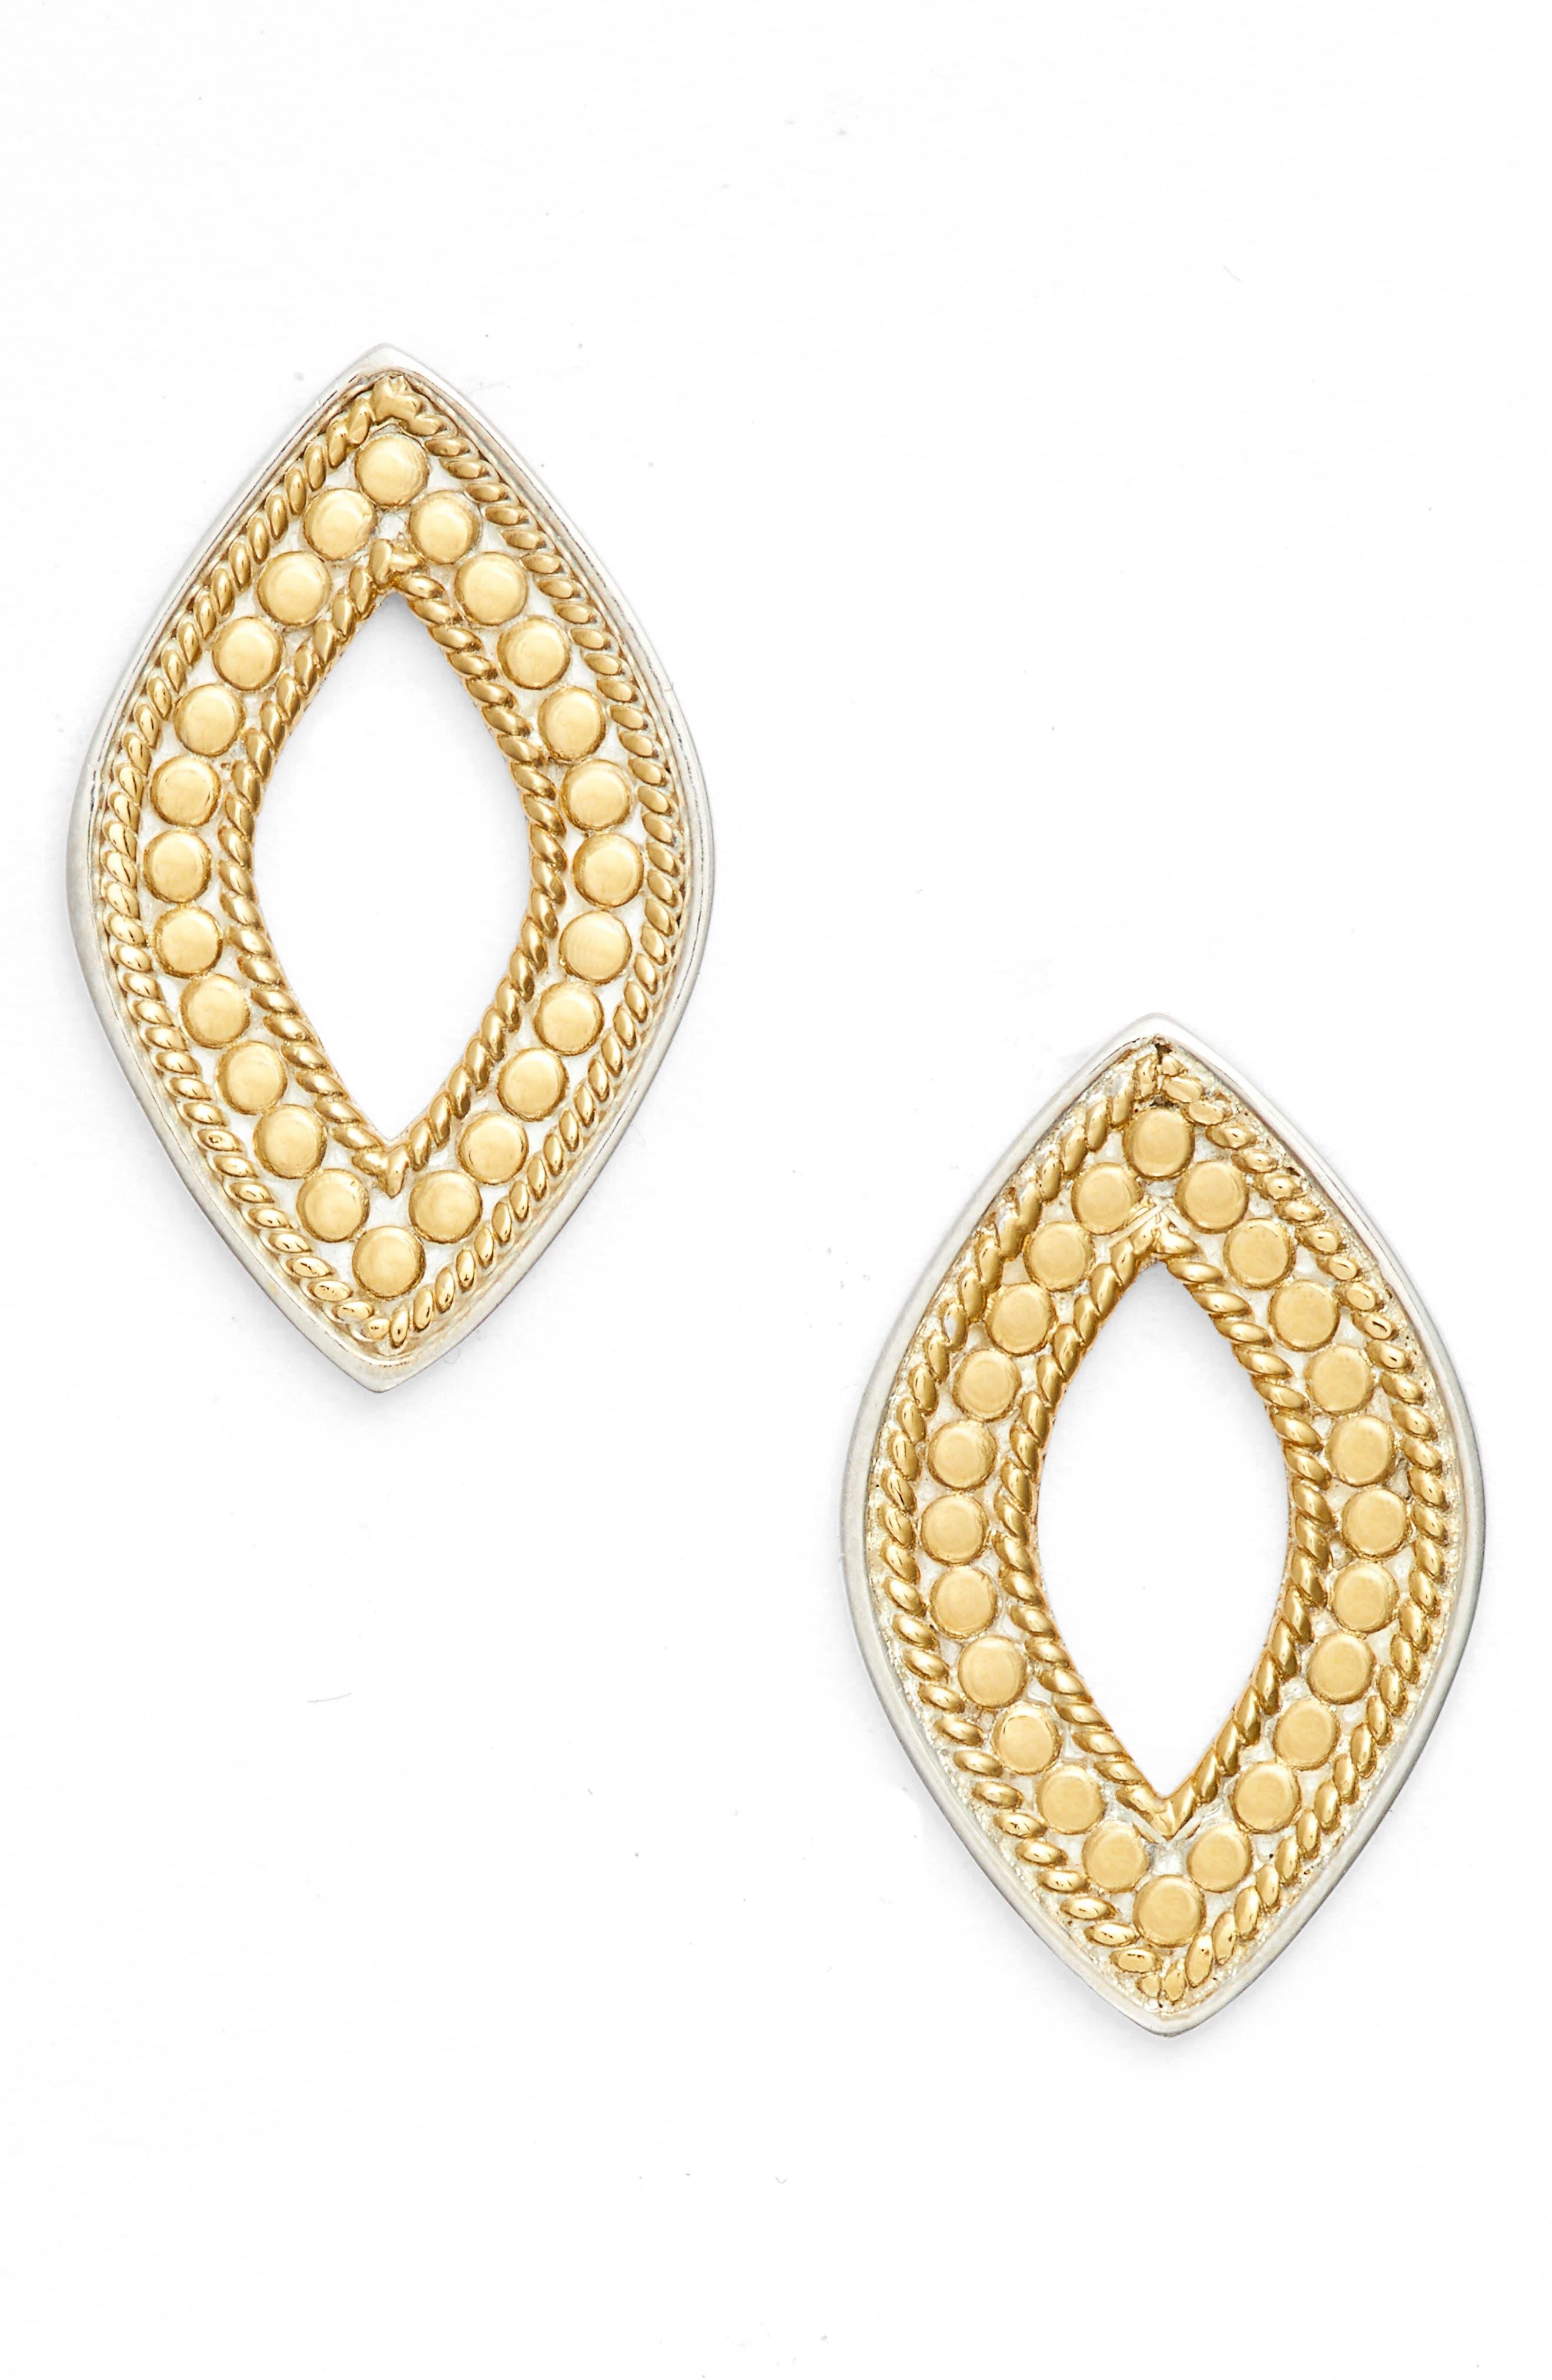 Main Image - Anna Beck Open Stud Earrings